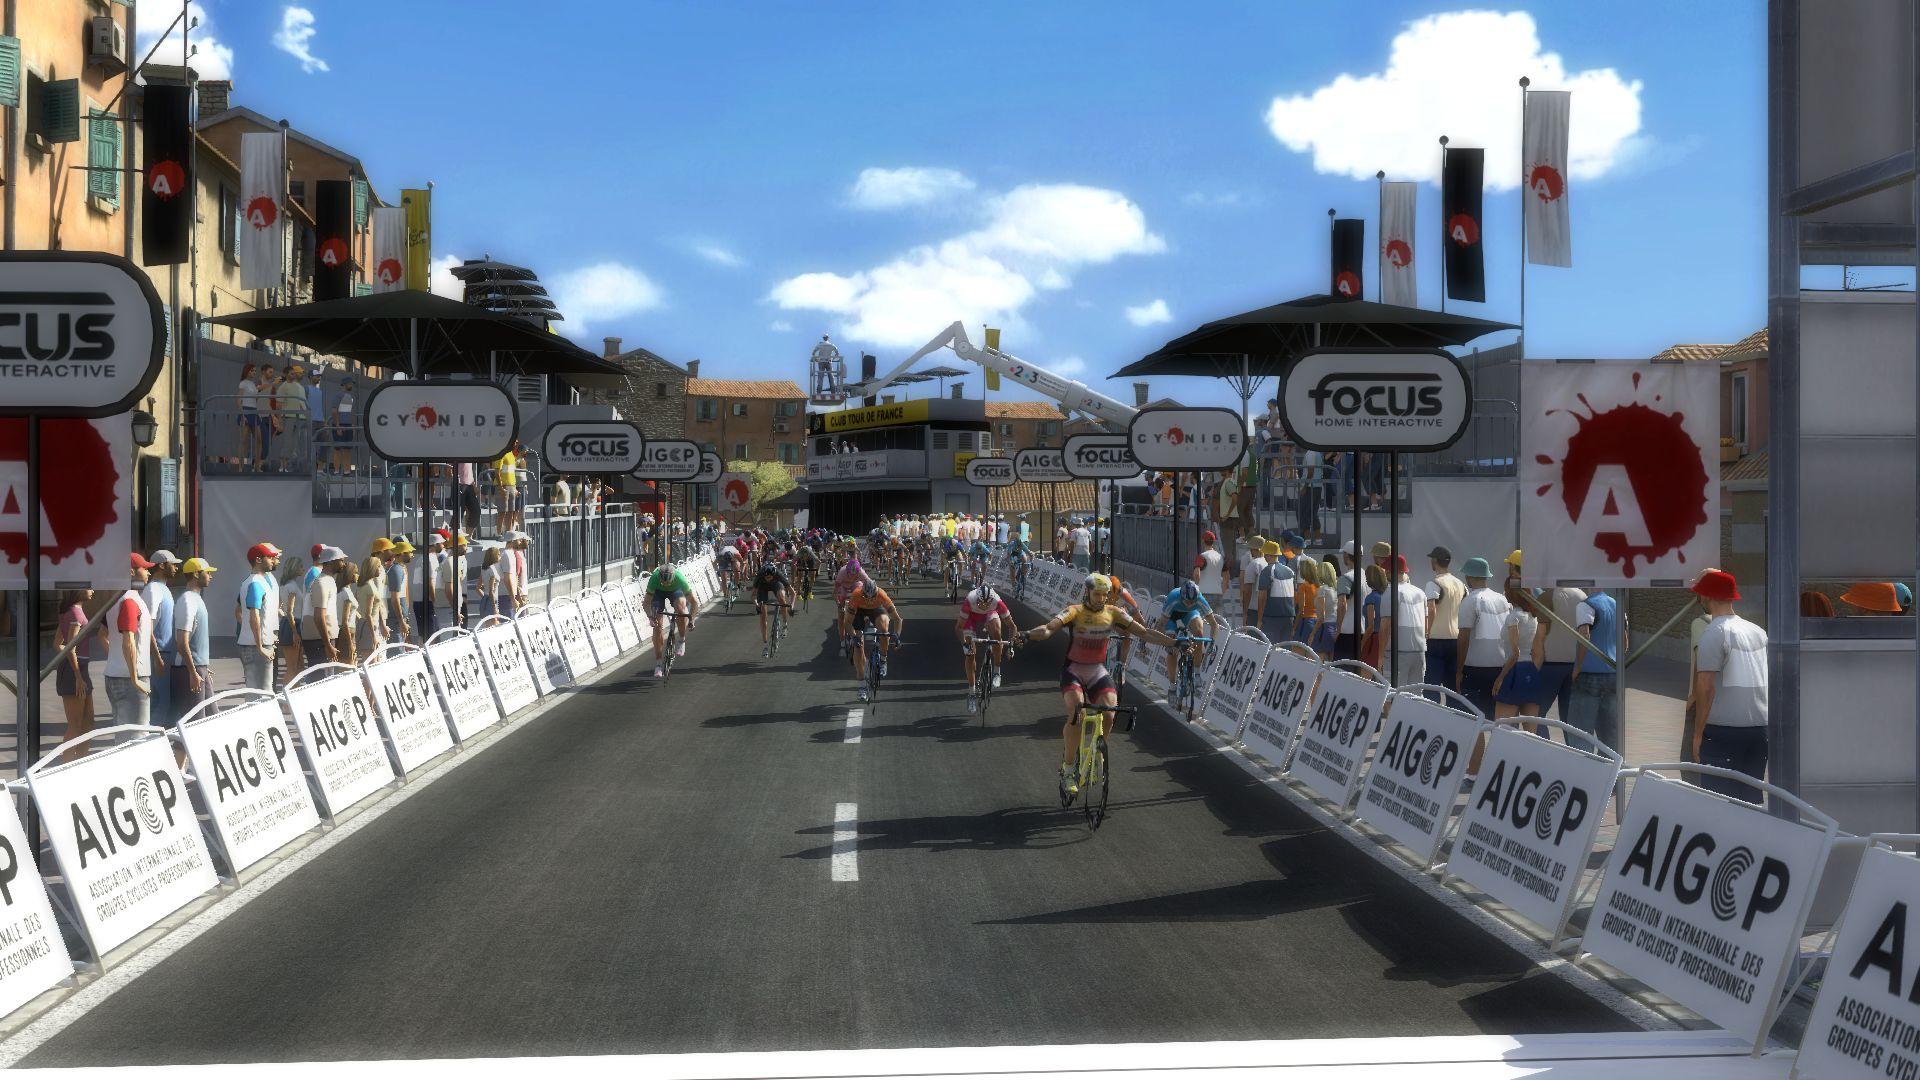 pcmdaily.com/images/mg/2019/Races/PT/Tirreno/mg19_ta_s07_25.jpg